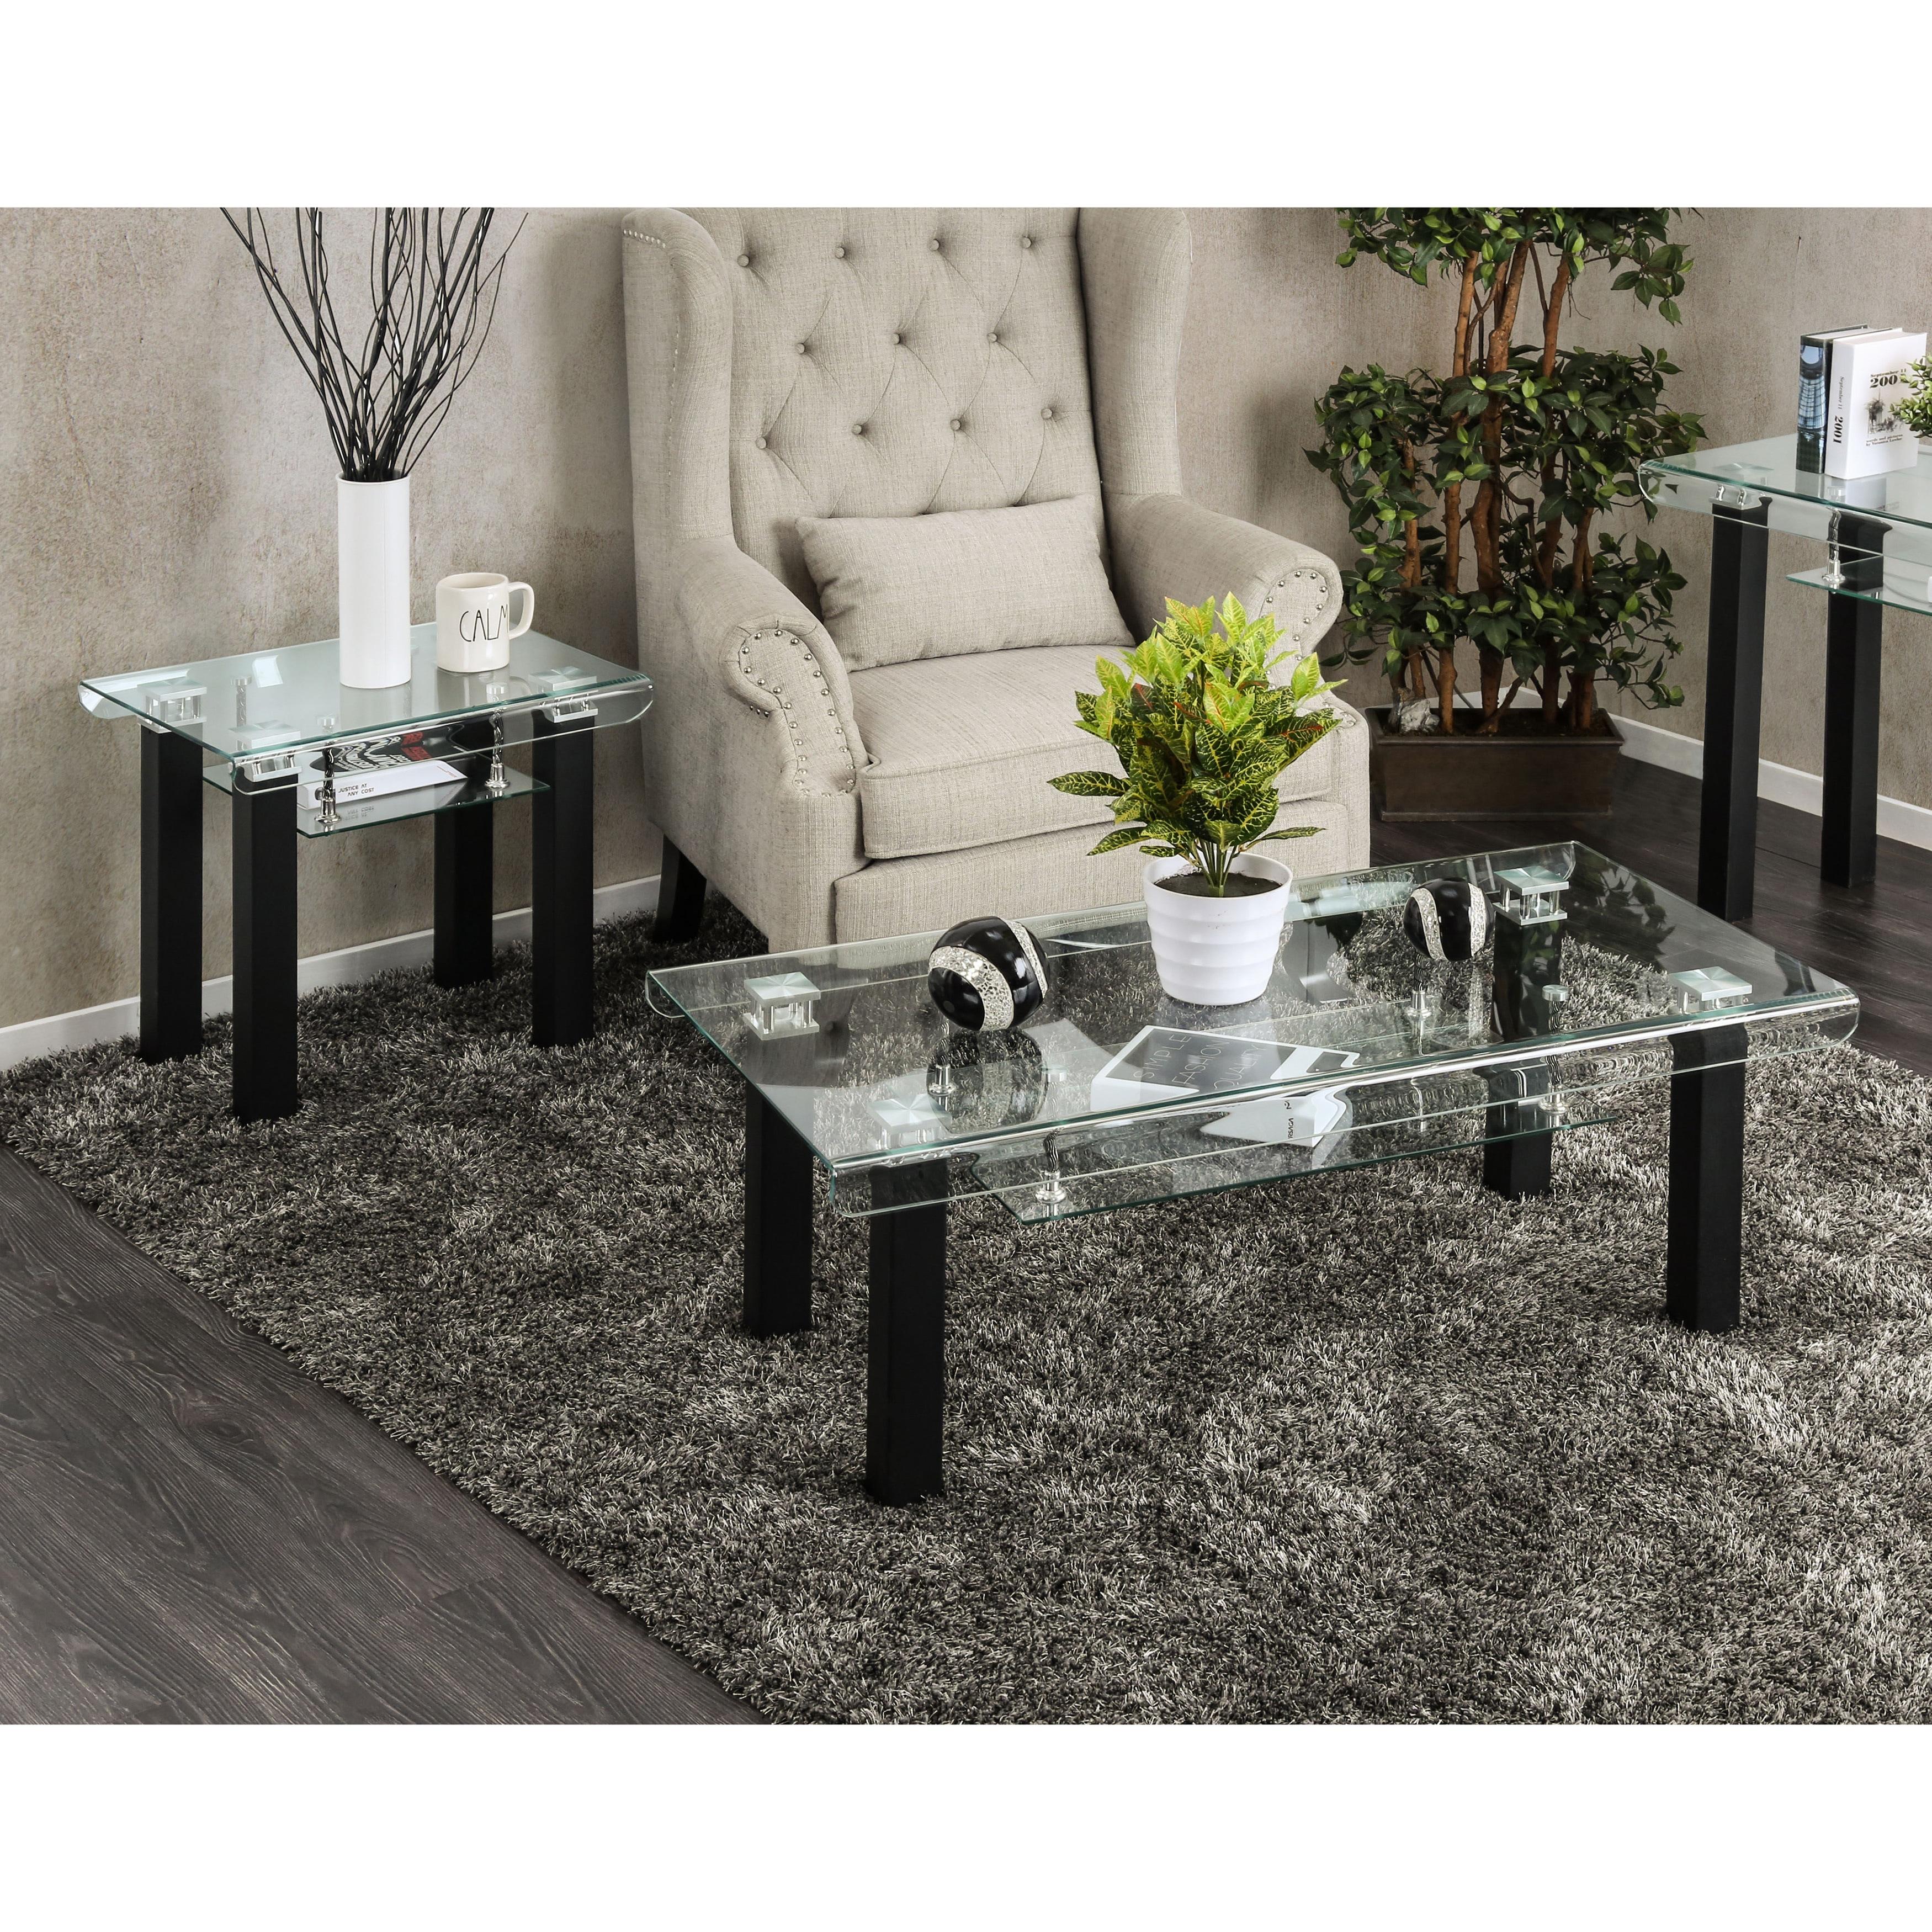 Clay Alder Home Four Bears Contemporary 2-piece Glass Top Matte Black Accent Table Set